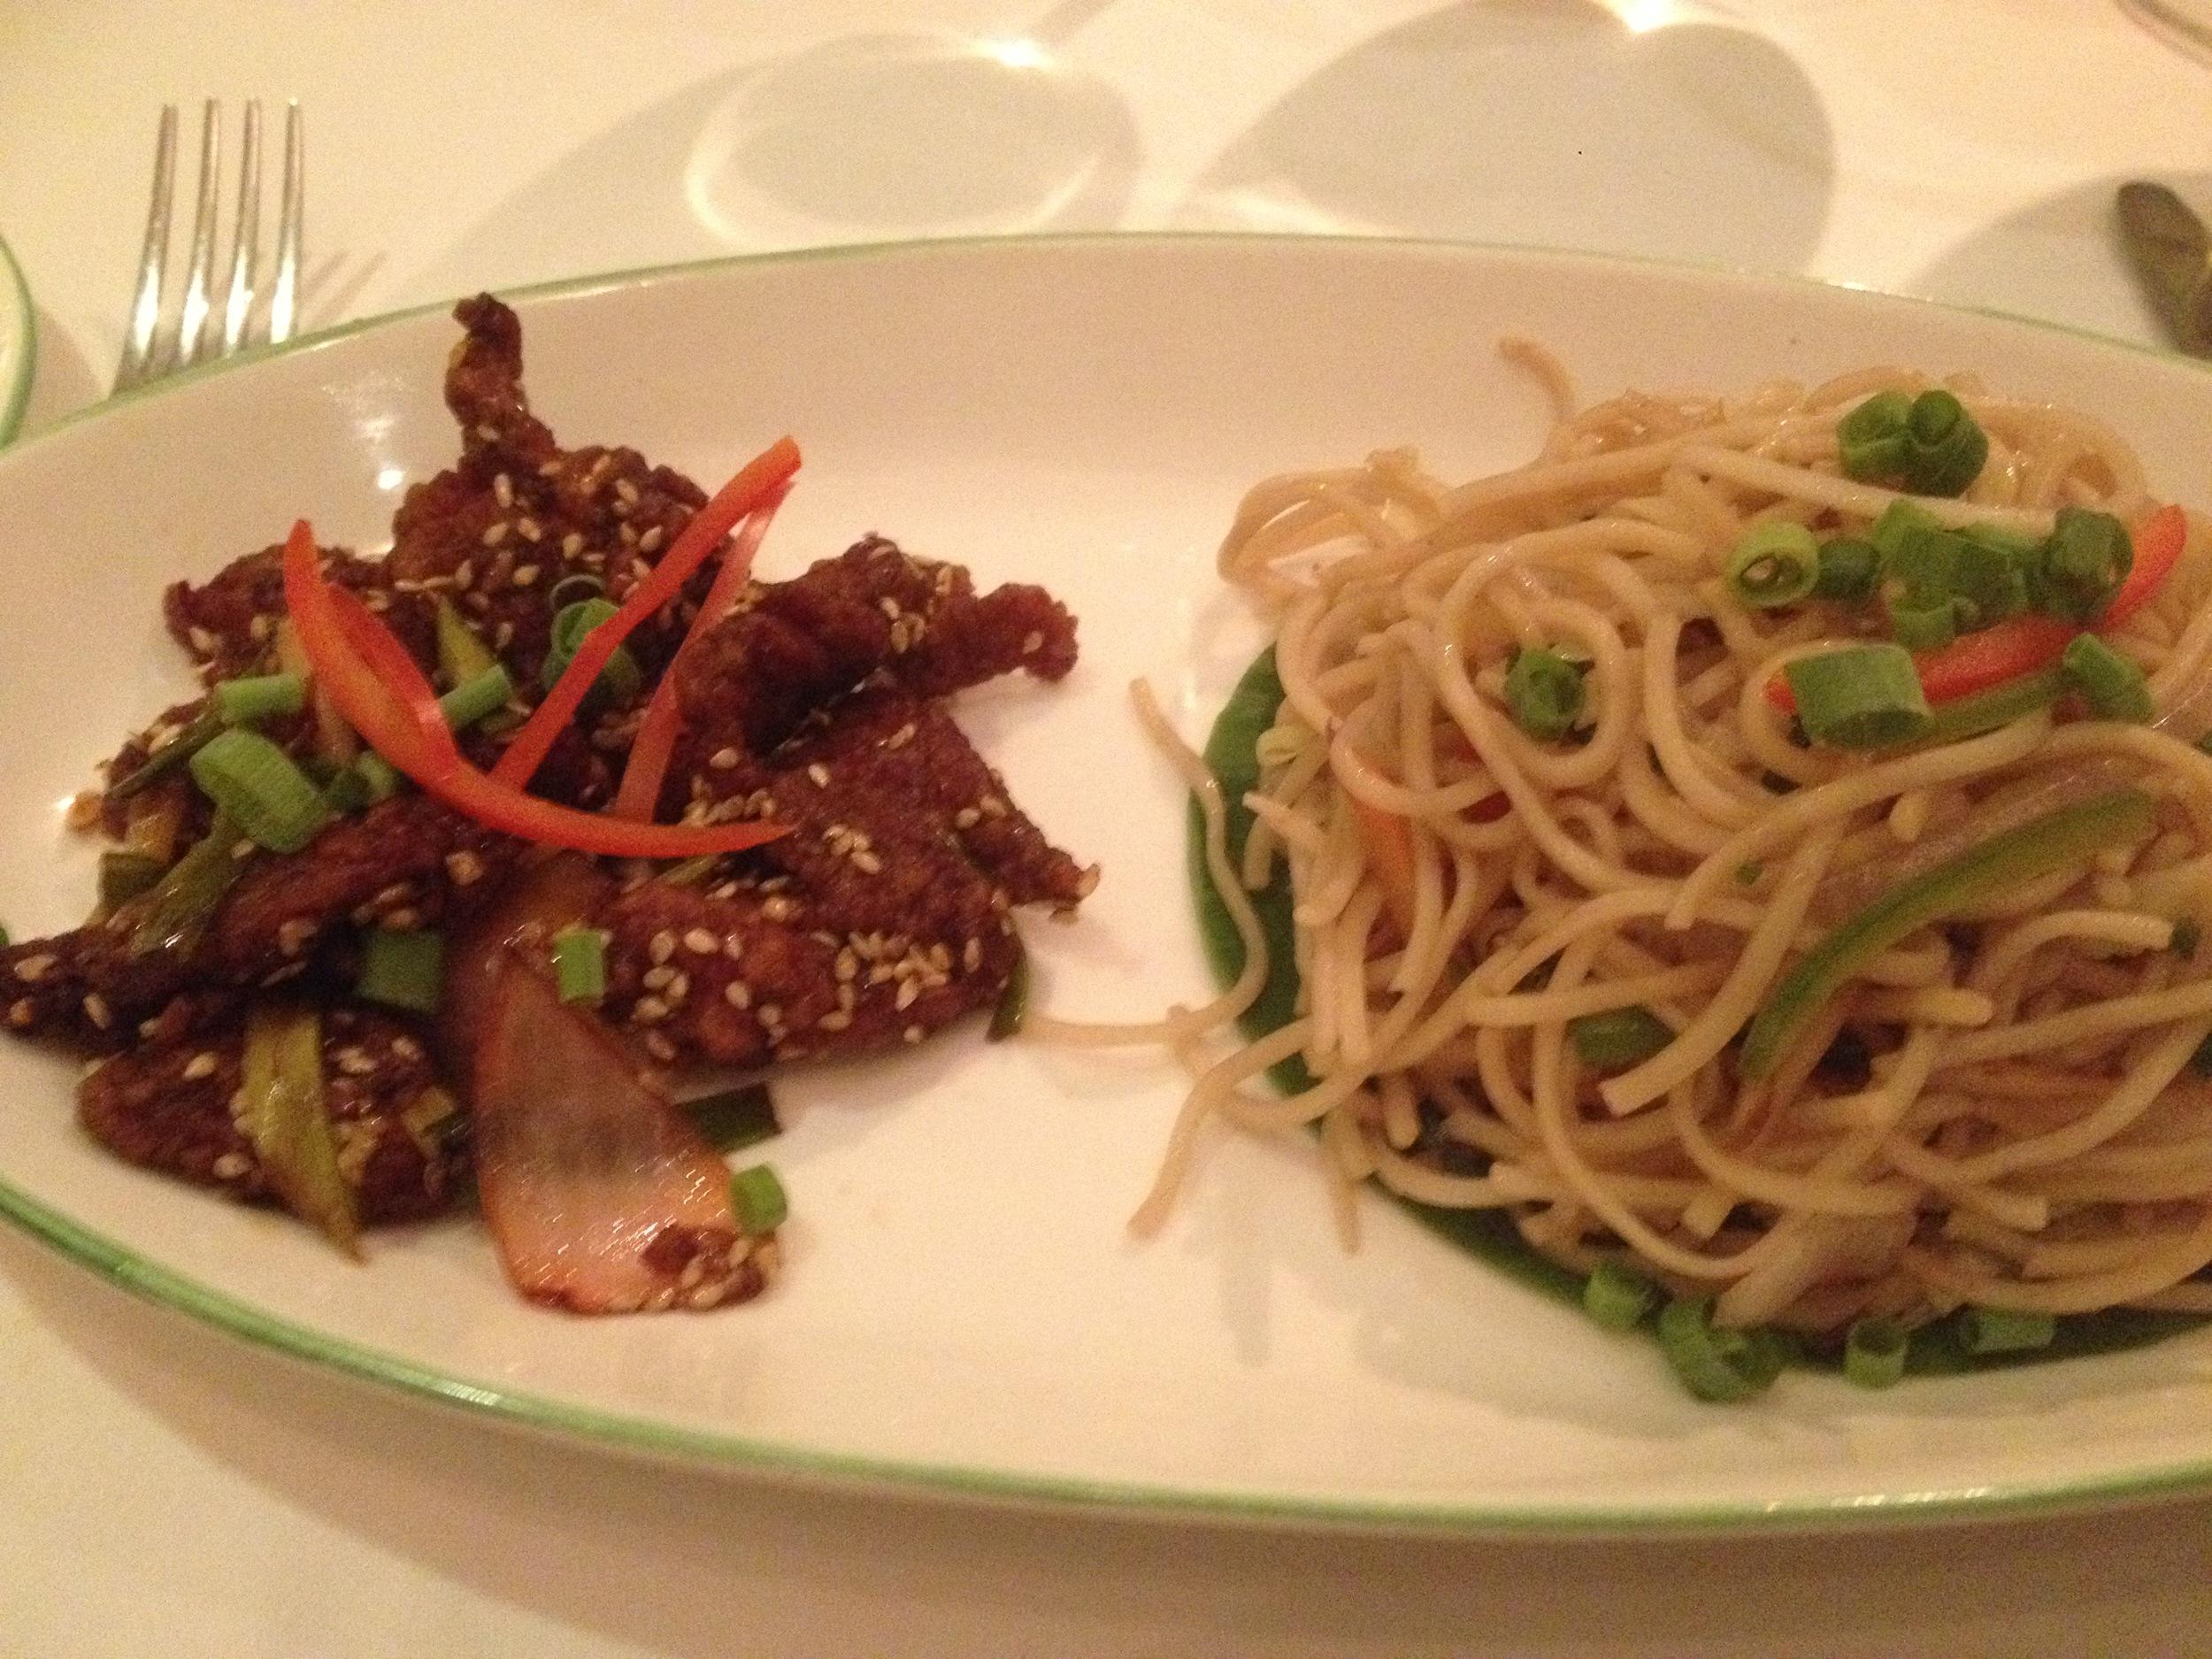 Crispy Lamb with Sesame Seeds and Hakka Noodles